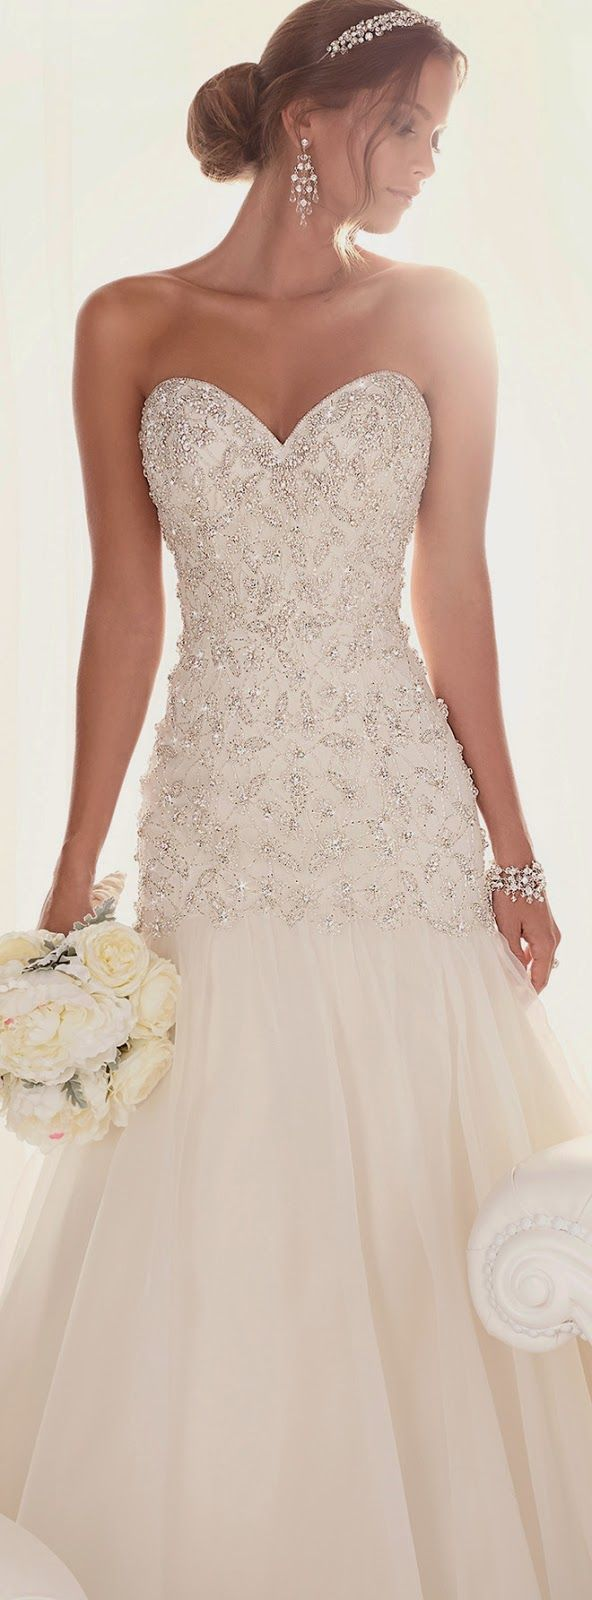 best-wedding-dresses-of-2014-27a